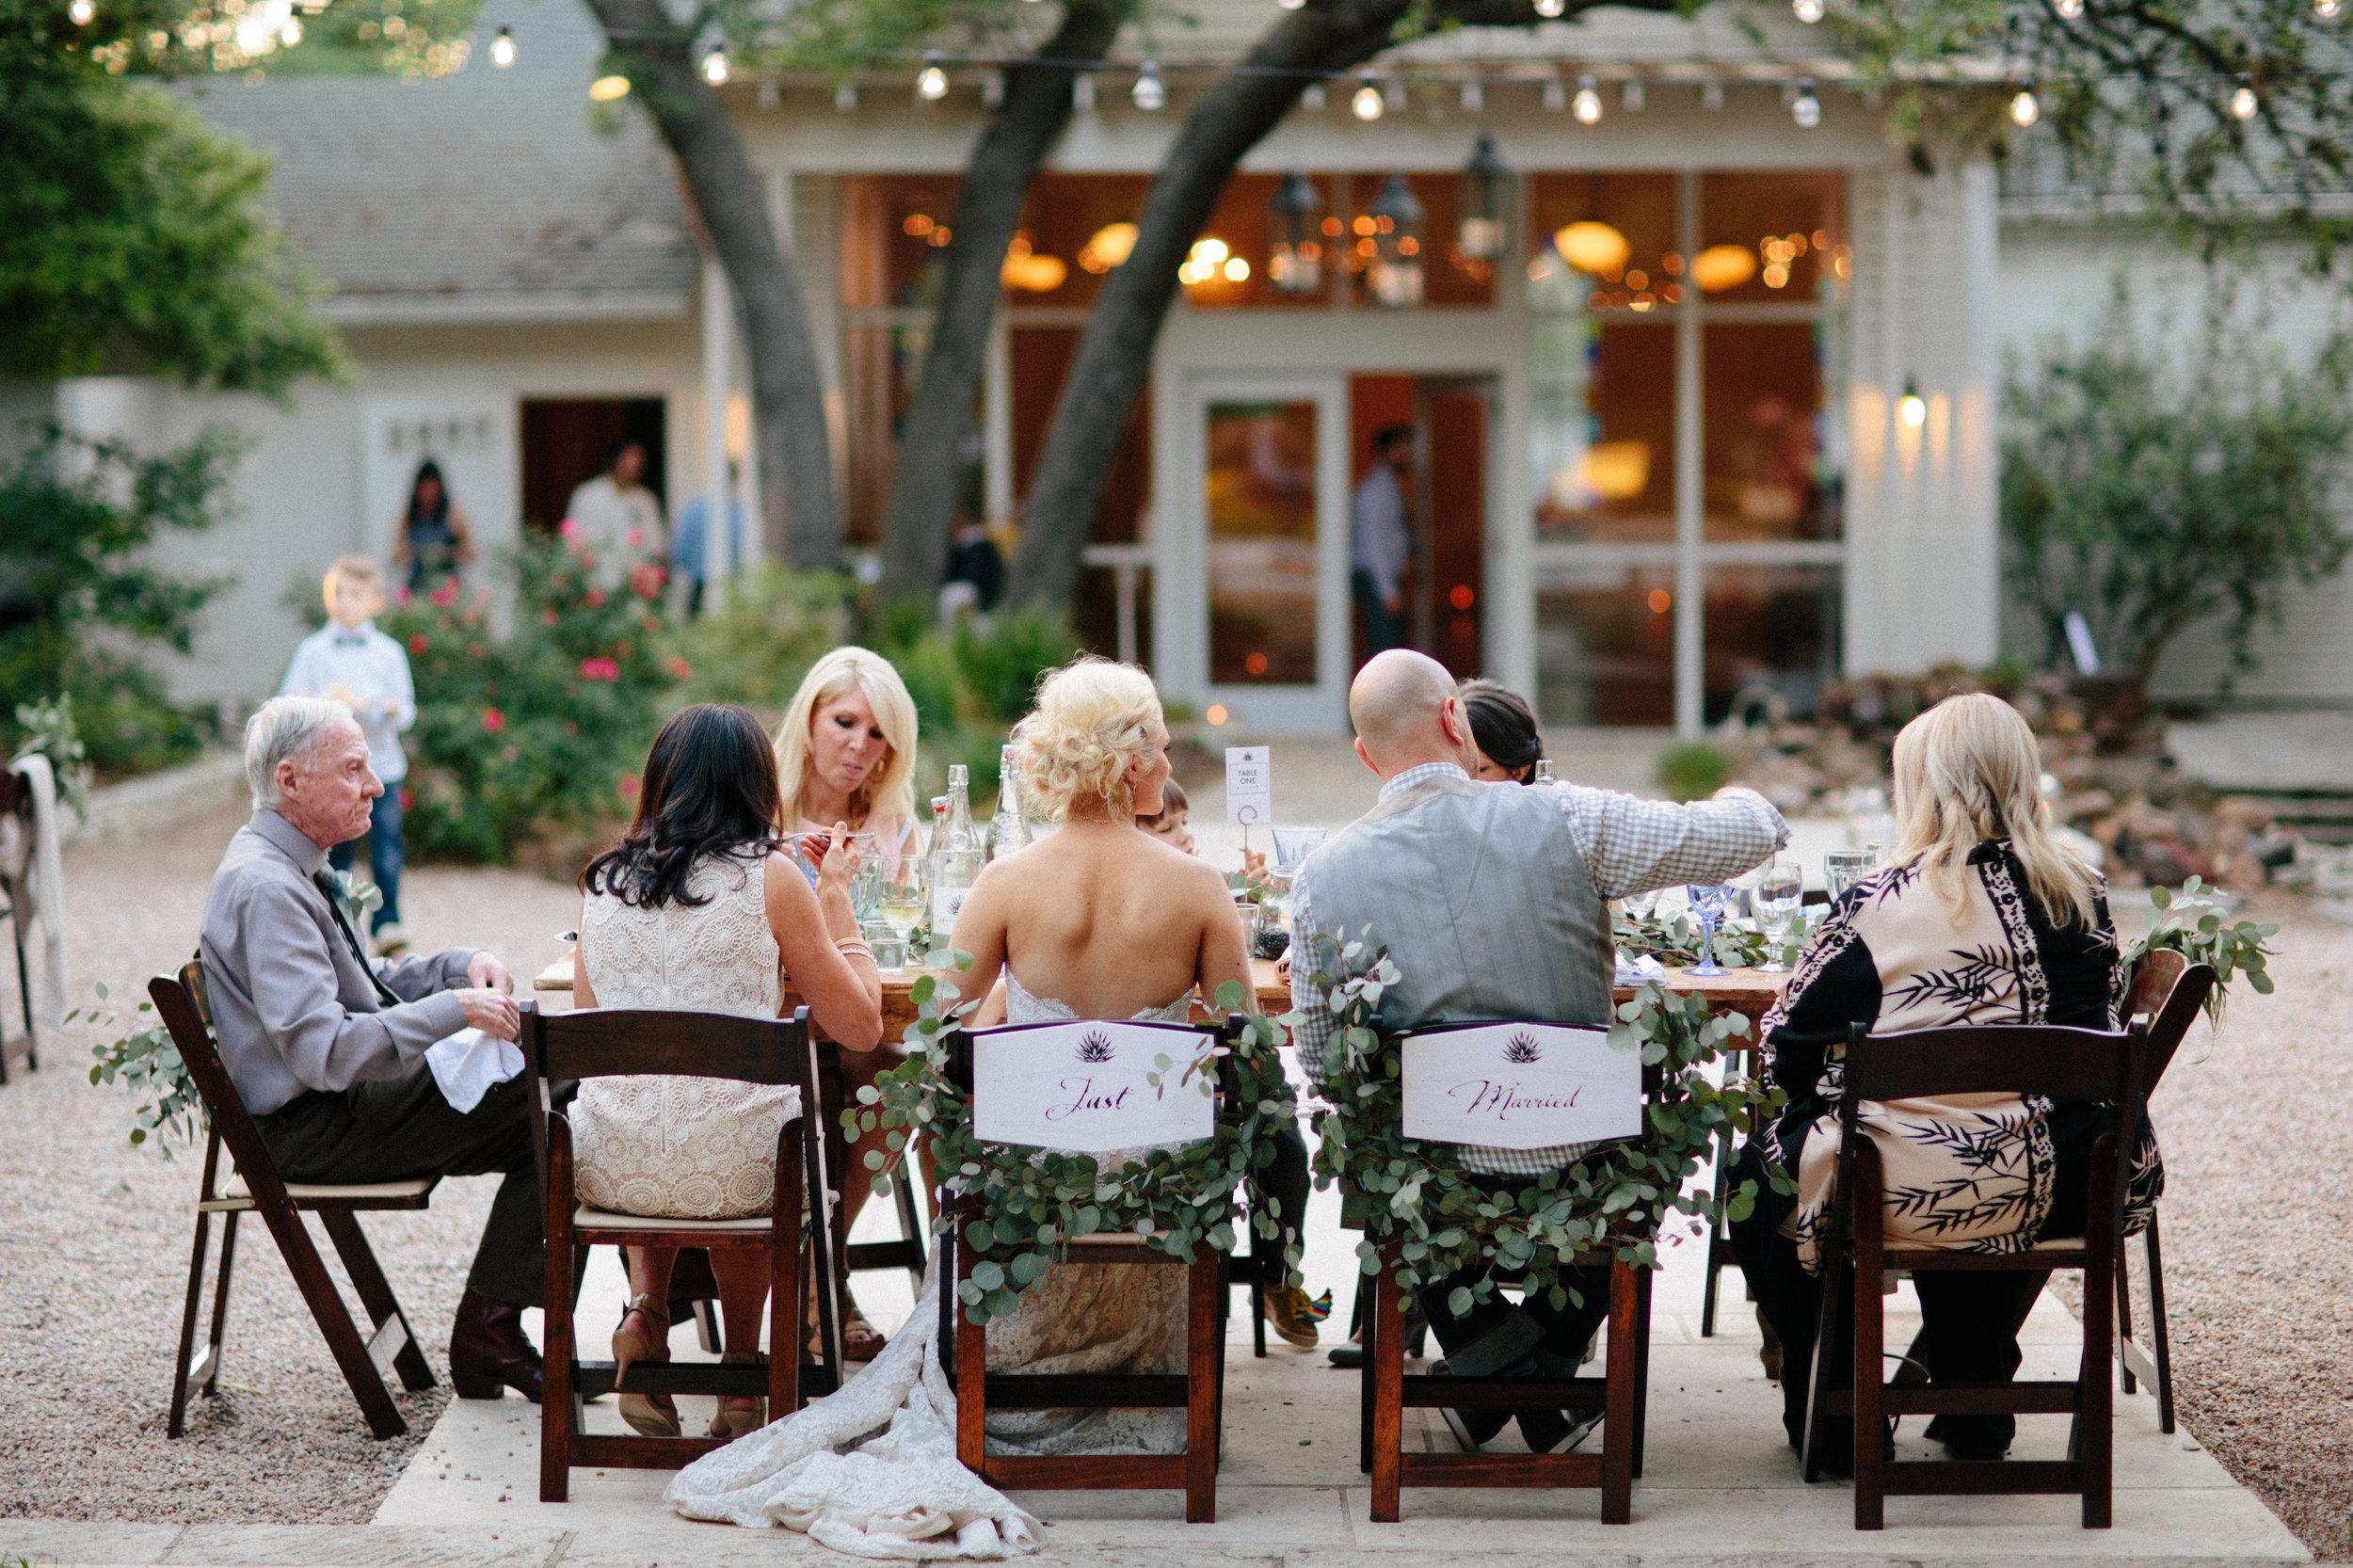 Paige-Newton-Intimate-Wedding-Photography-Mercury-Hall-Dinner.jpg